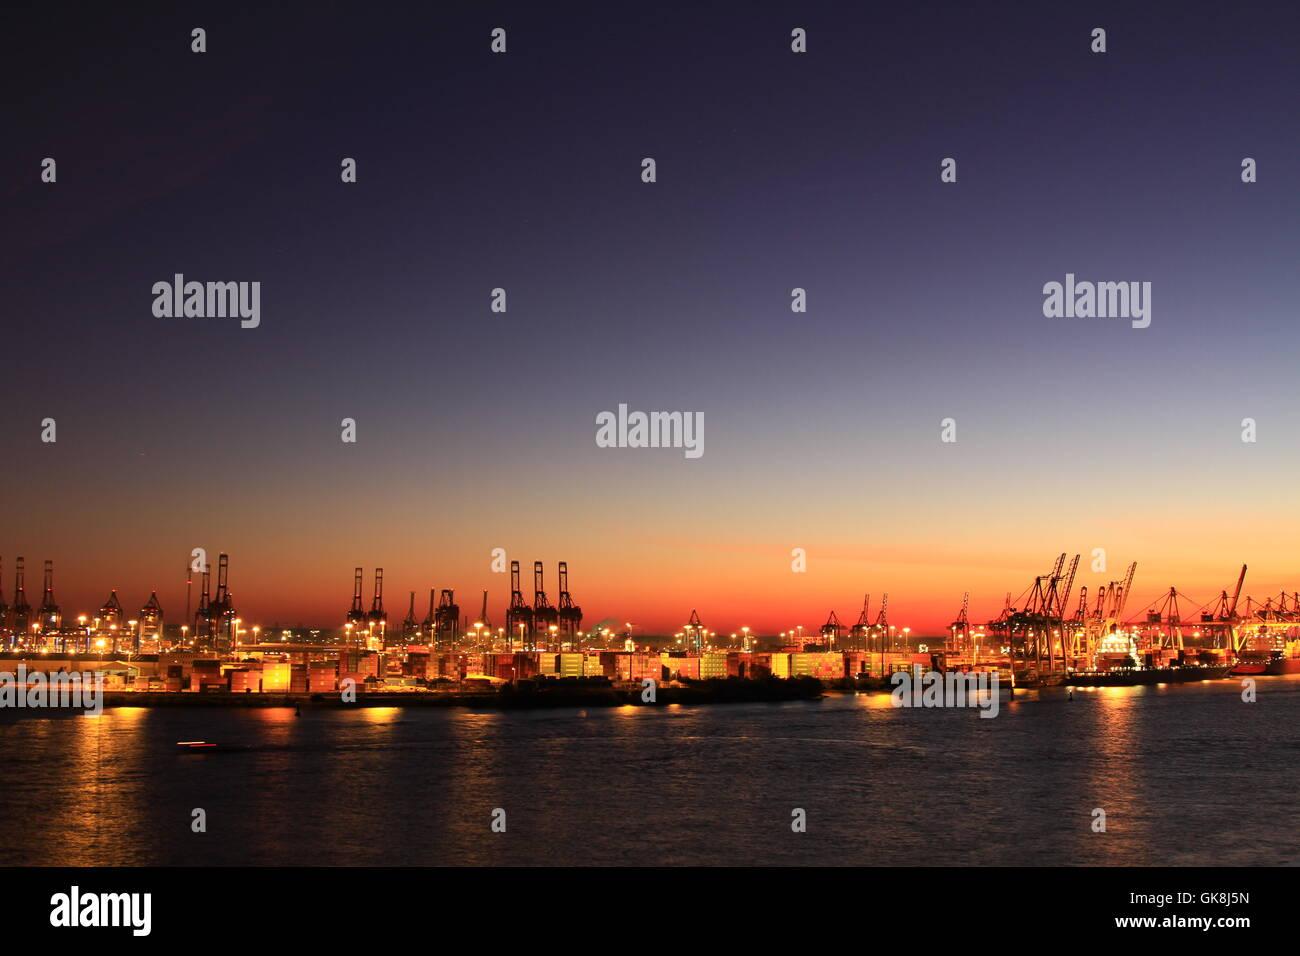 docklands hamburg - Stock Image